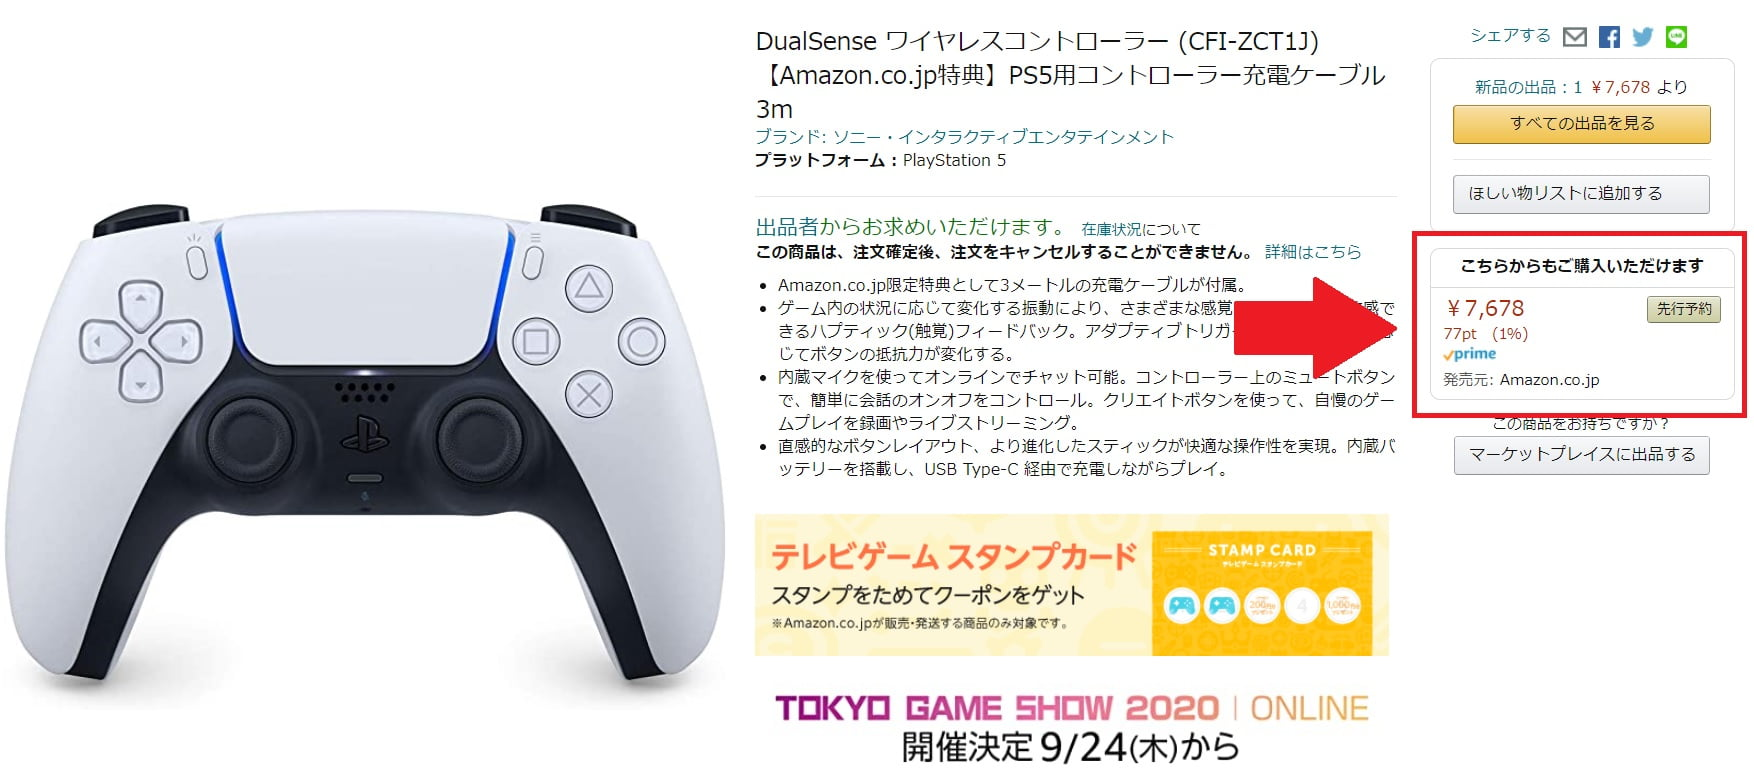 PS5のコントローラー(DualSense )